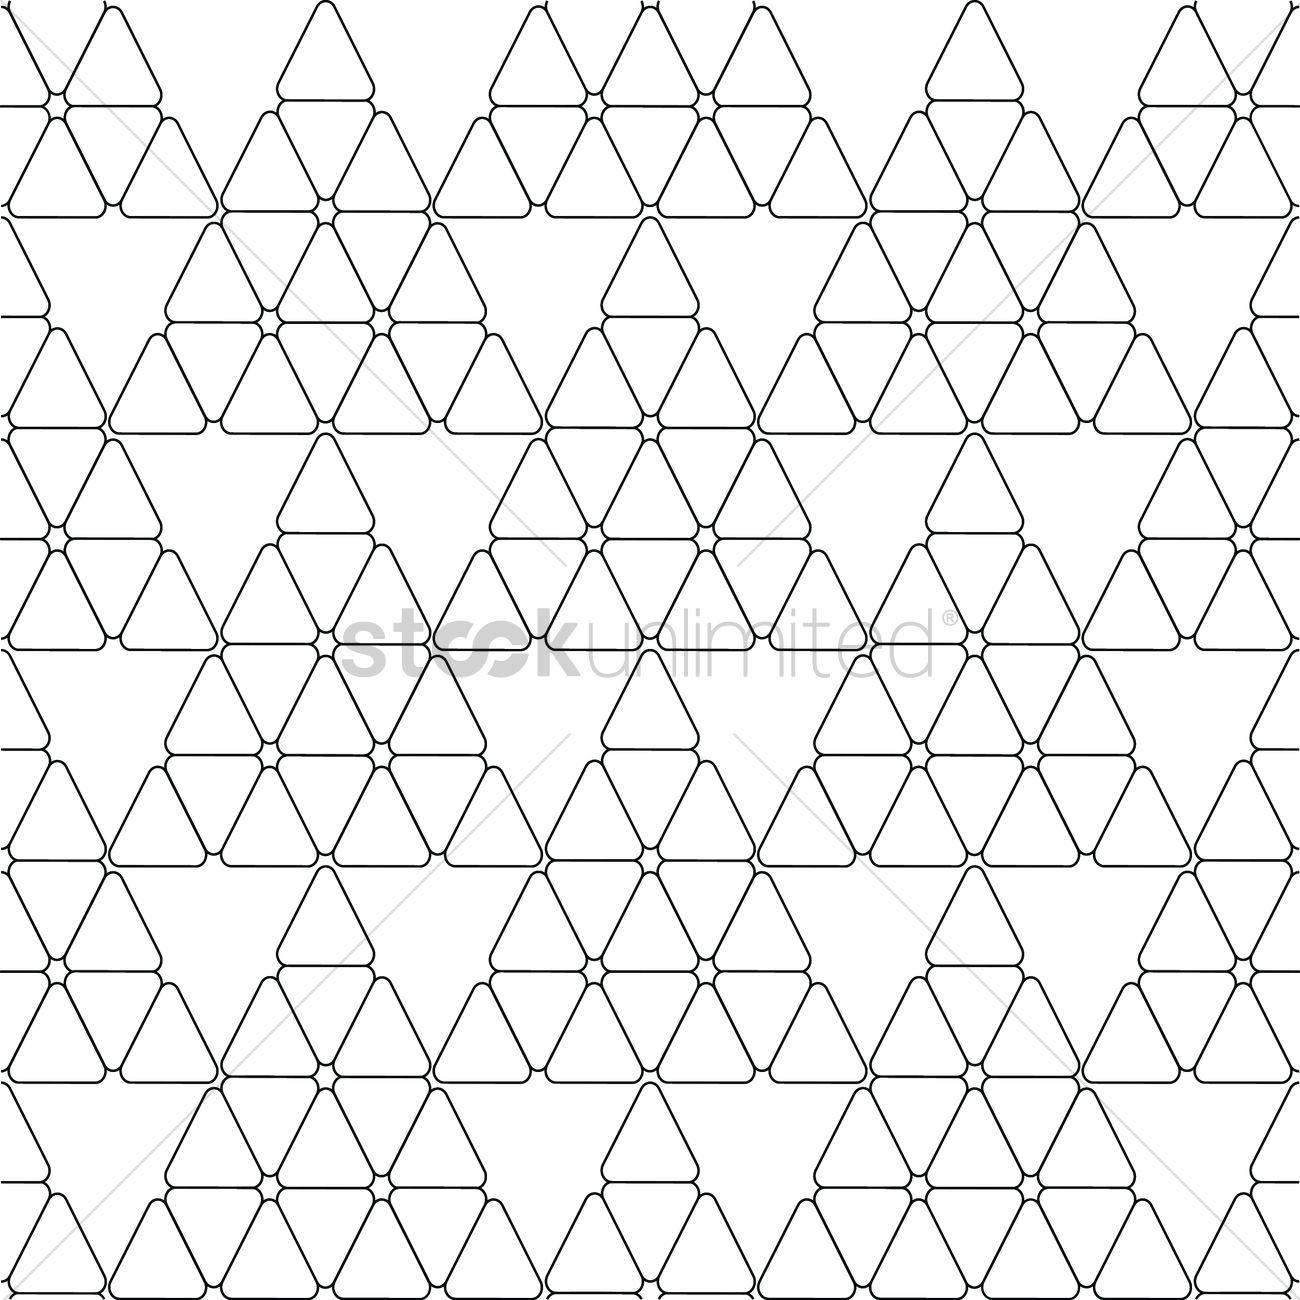 1300x1300 Geometric Lines Pattern Vector Image